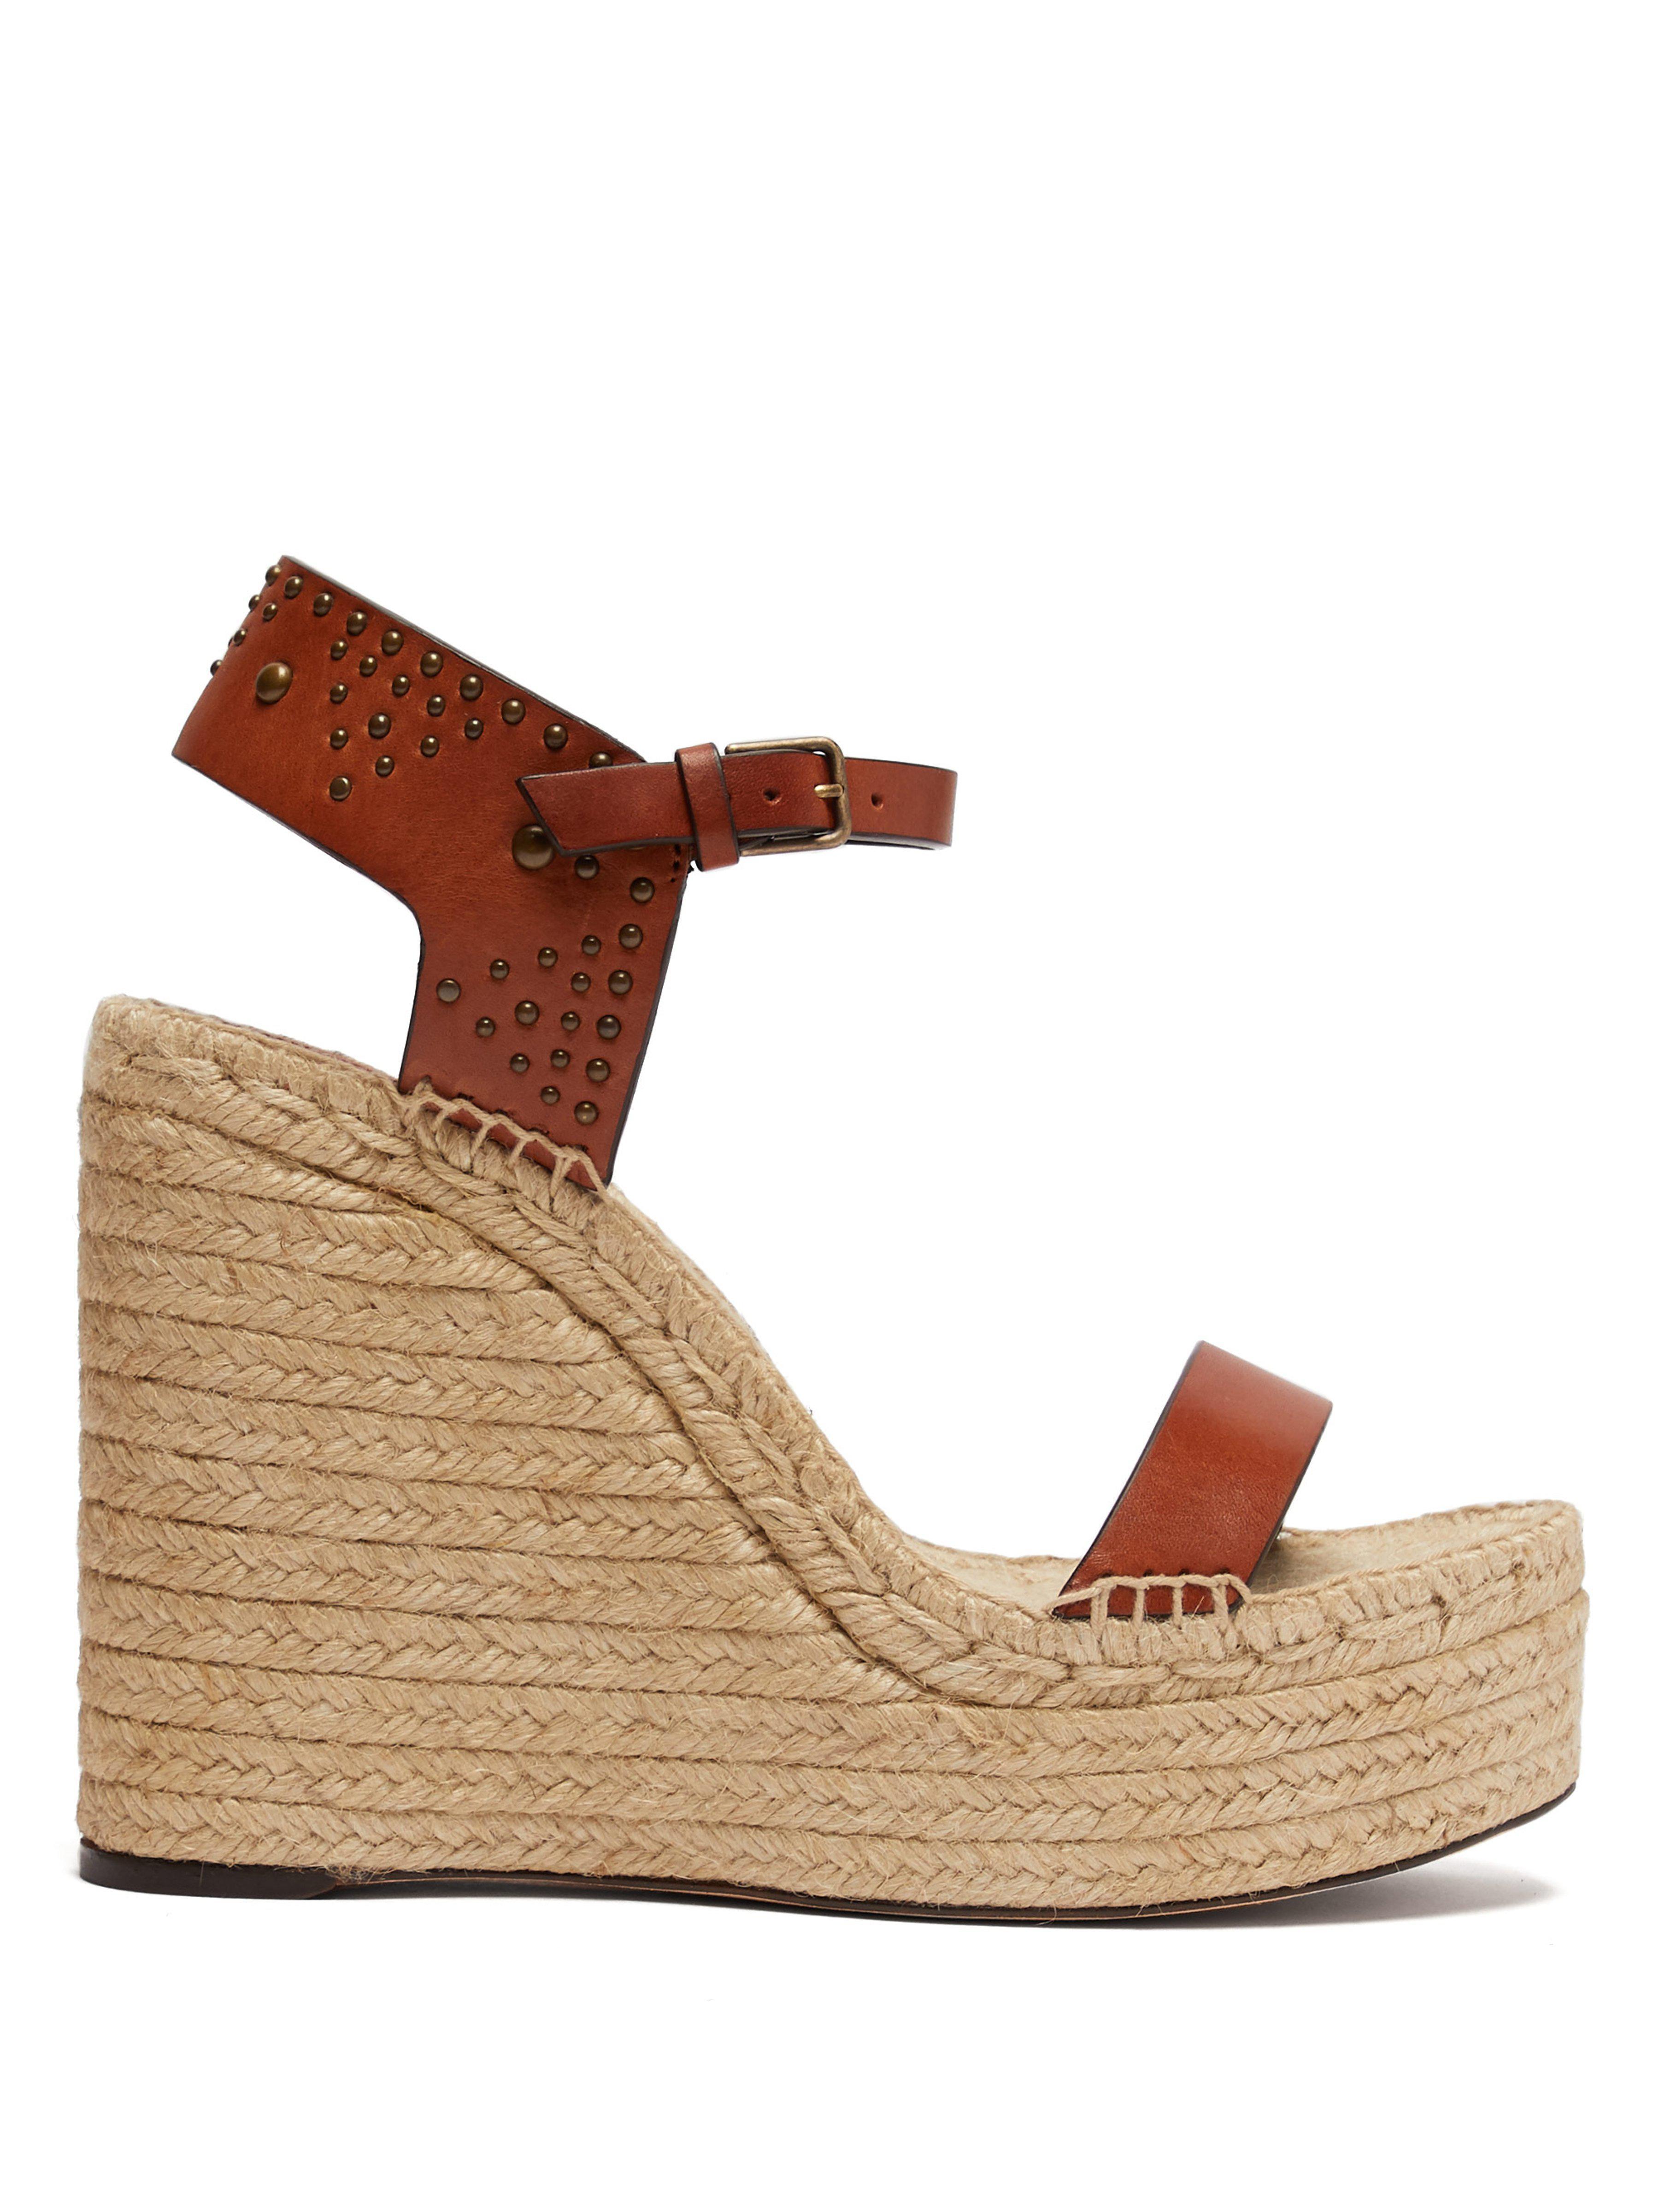 fa4254738c6 Saint Laurent. Women s Brown Leather Platform Wedge Espadrille Sandal